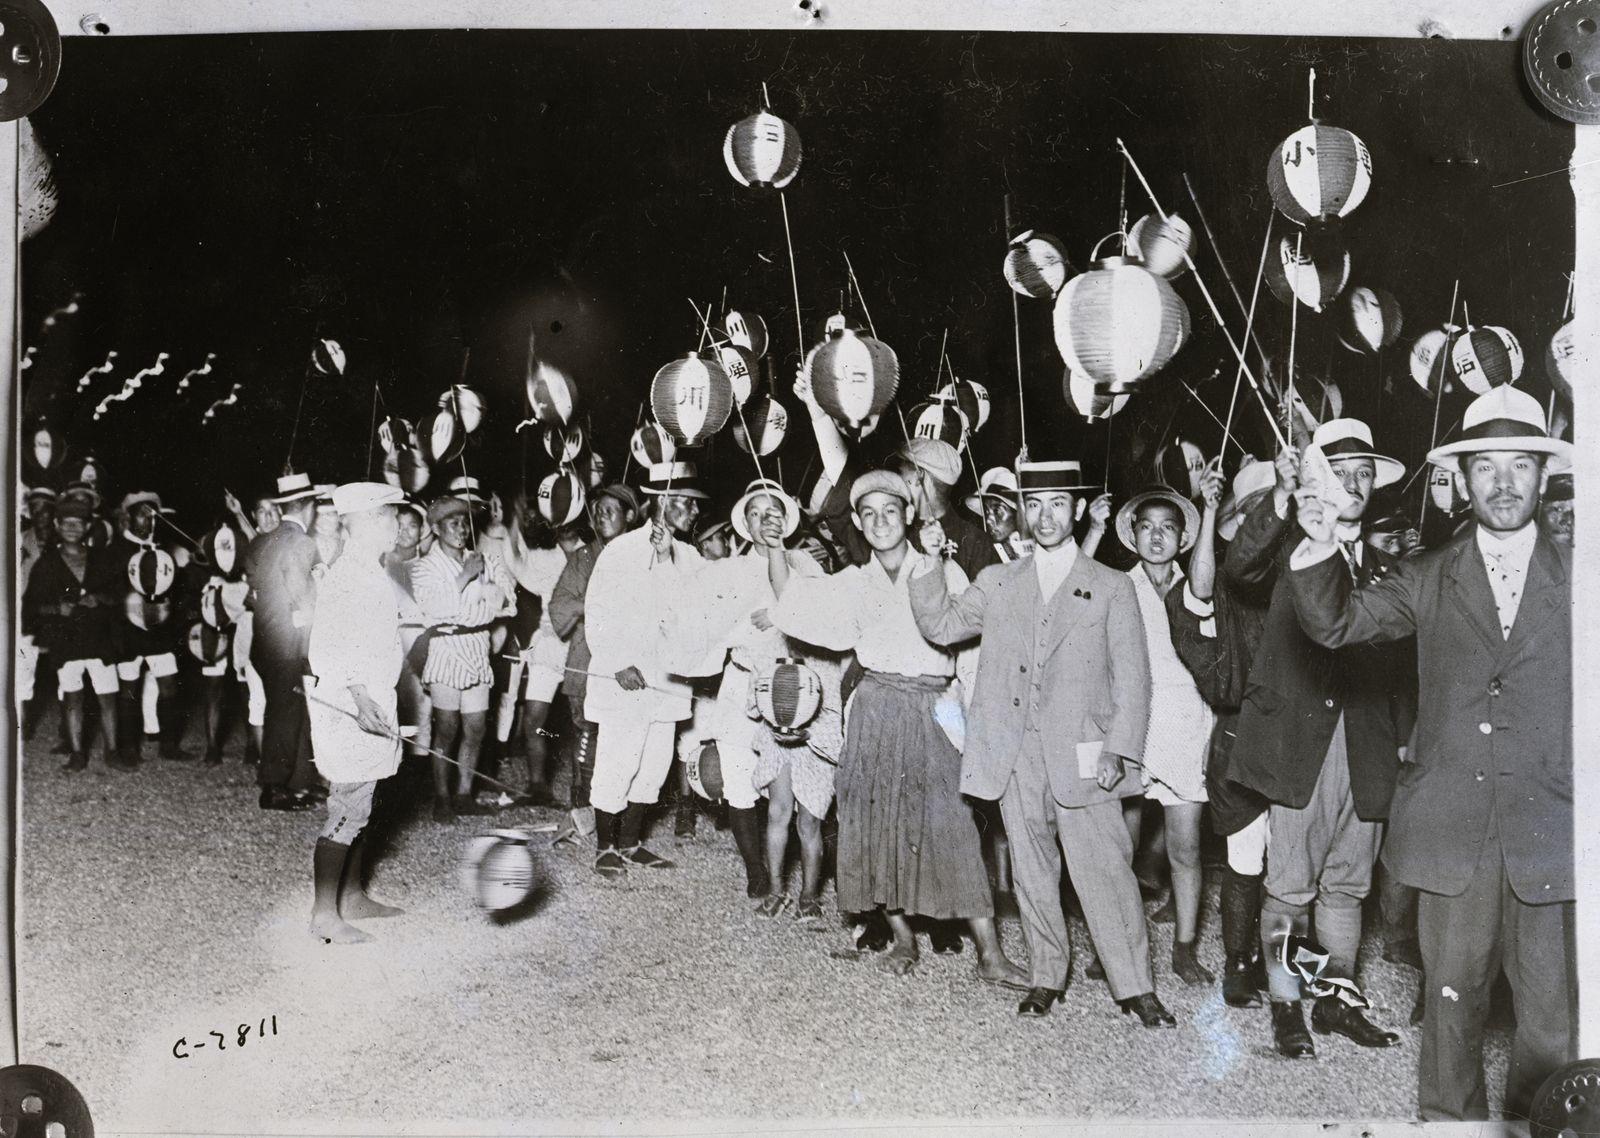 Lantern Procession, People Holding Lante